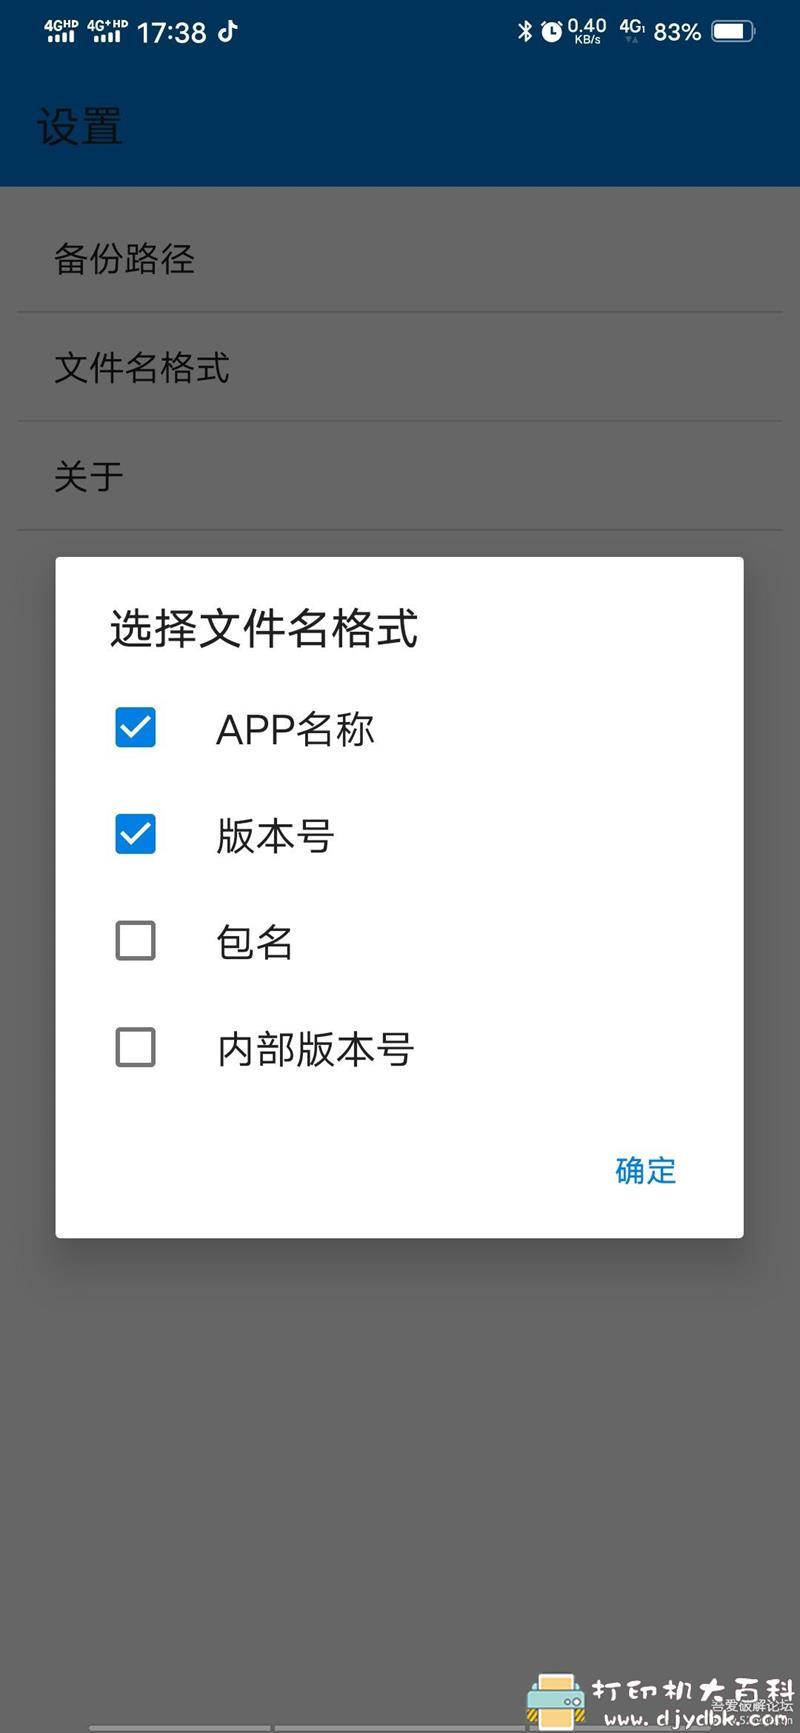 [Android]APK提取器1.3.7,提取手机已安装的应用图片 No.2